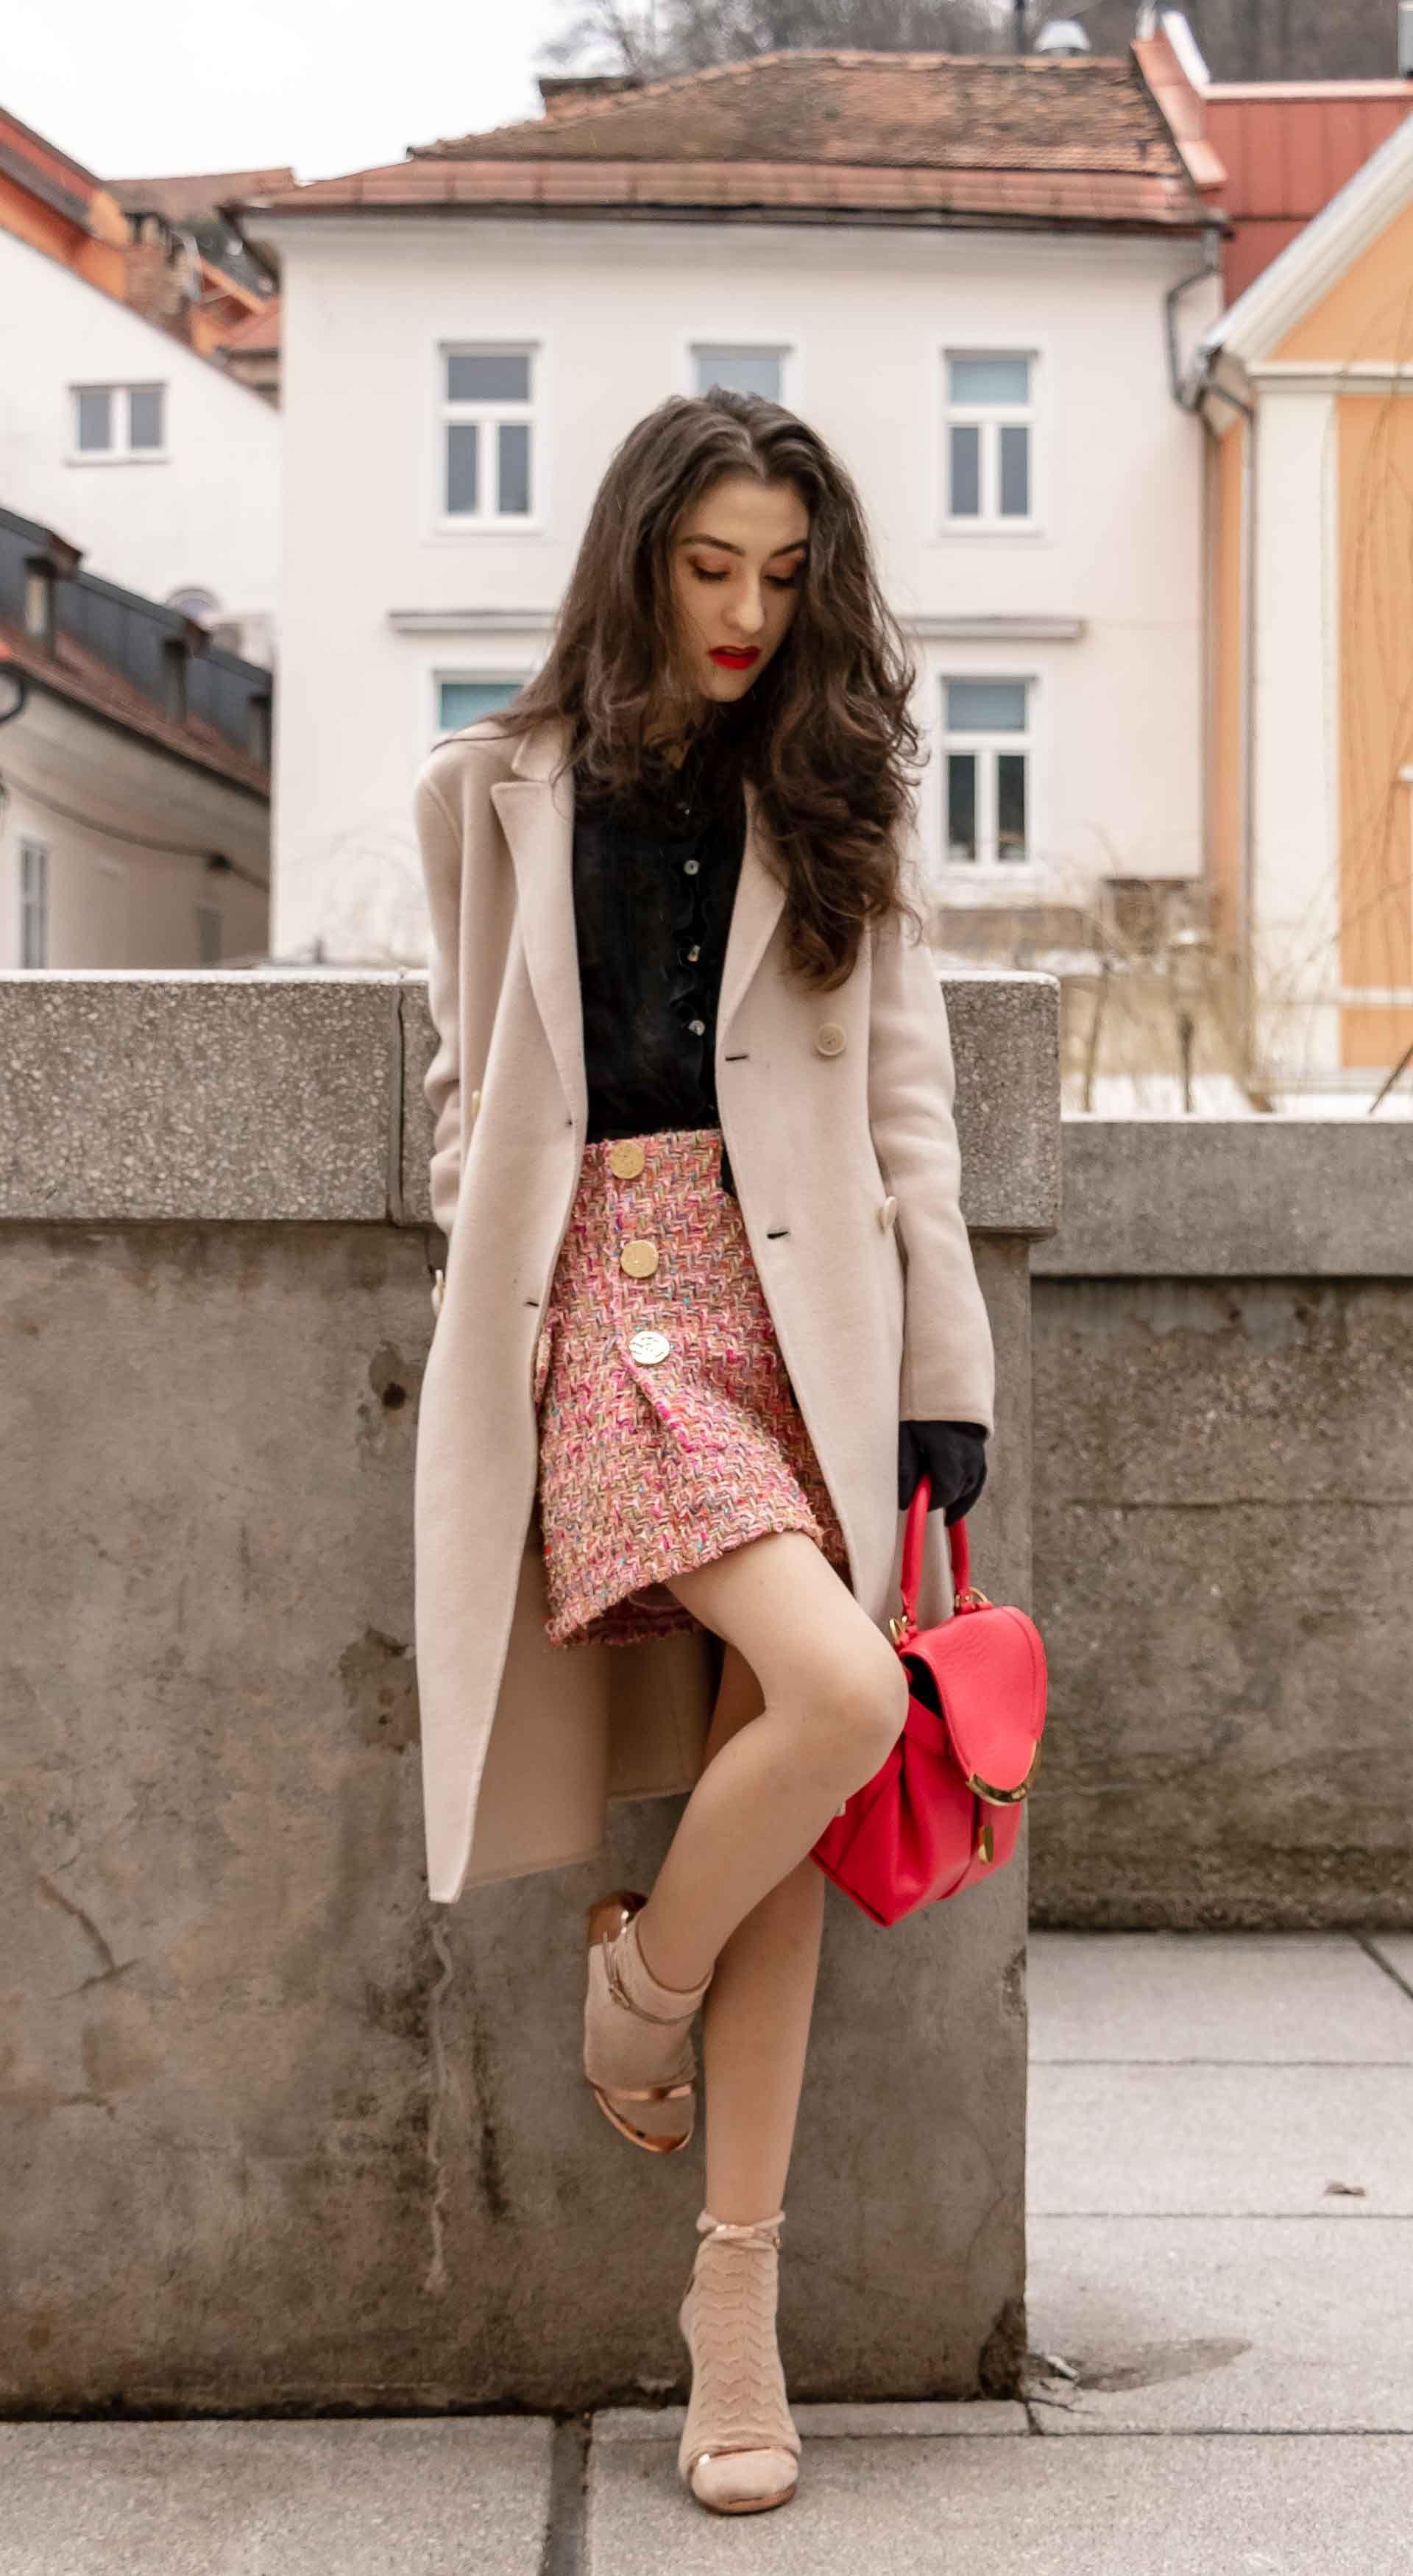 6e5c0e3969c955 Fashion Blogger Veronika Lipar of Brunette from Wall Street sharing 2 ways  to wear socks and sandals fashion trend in 2018  fashion  blogpost  socks  ...